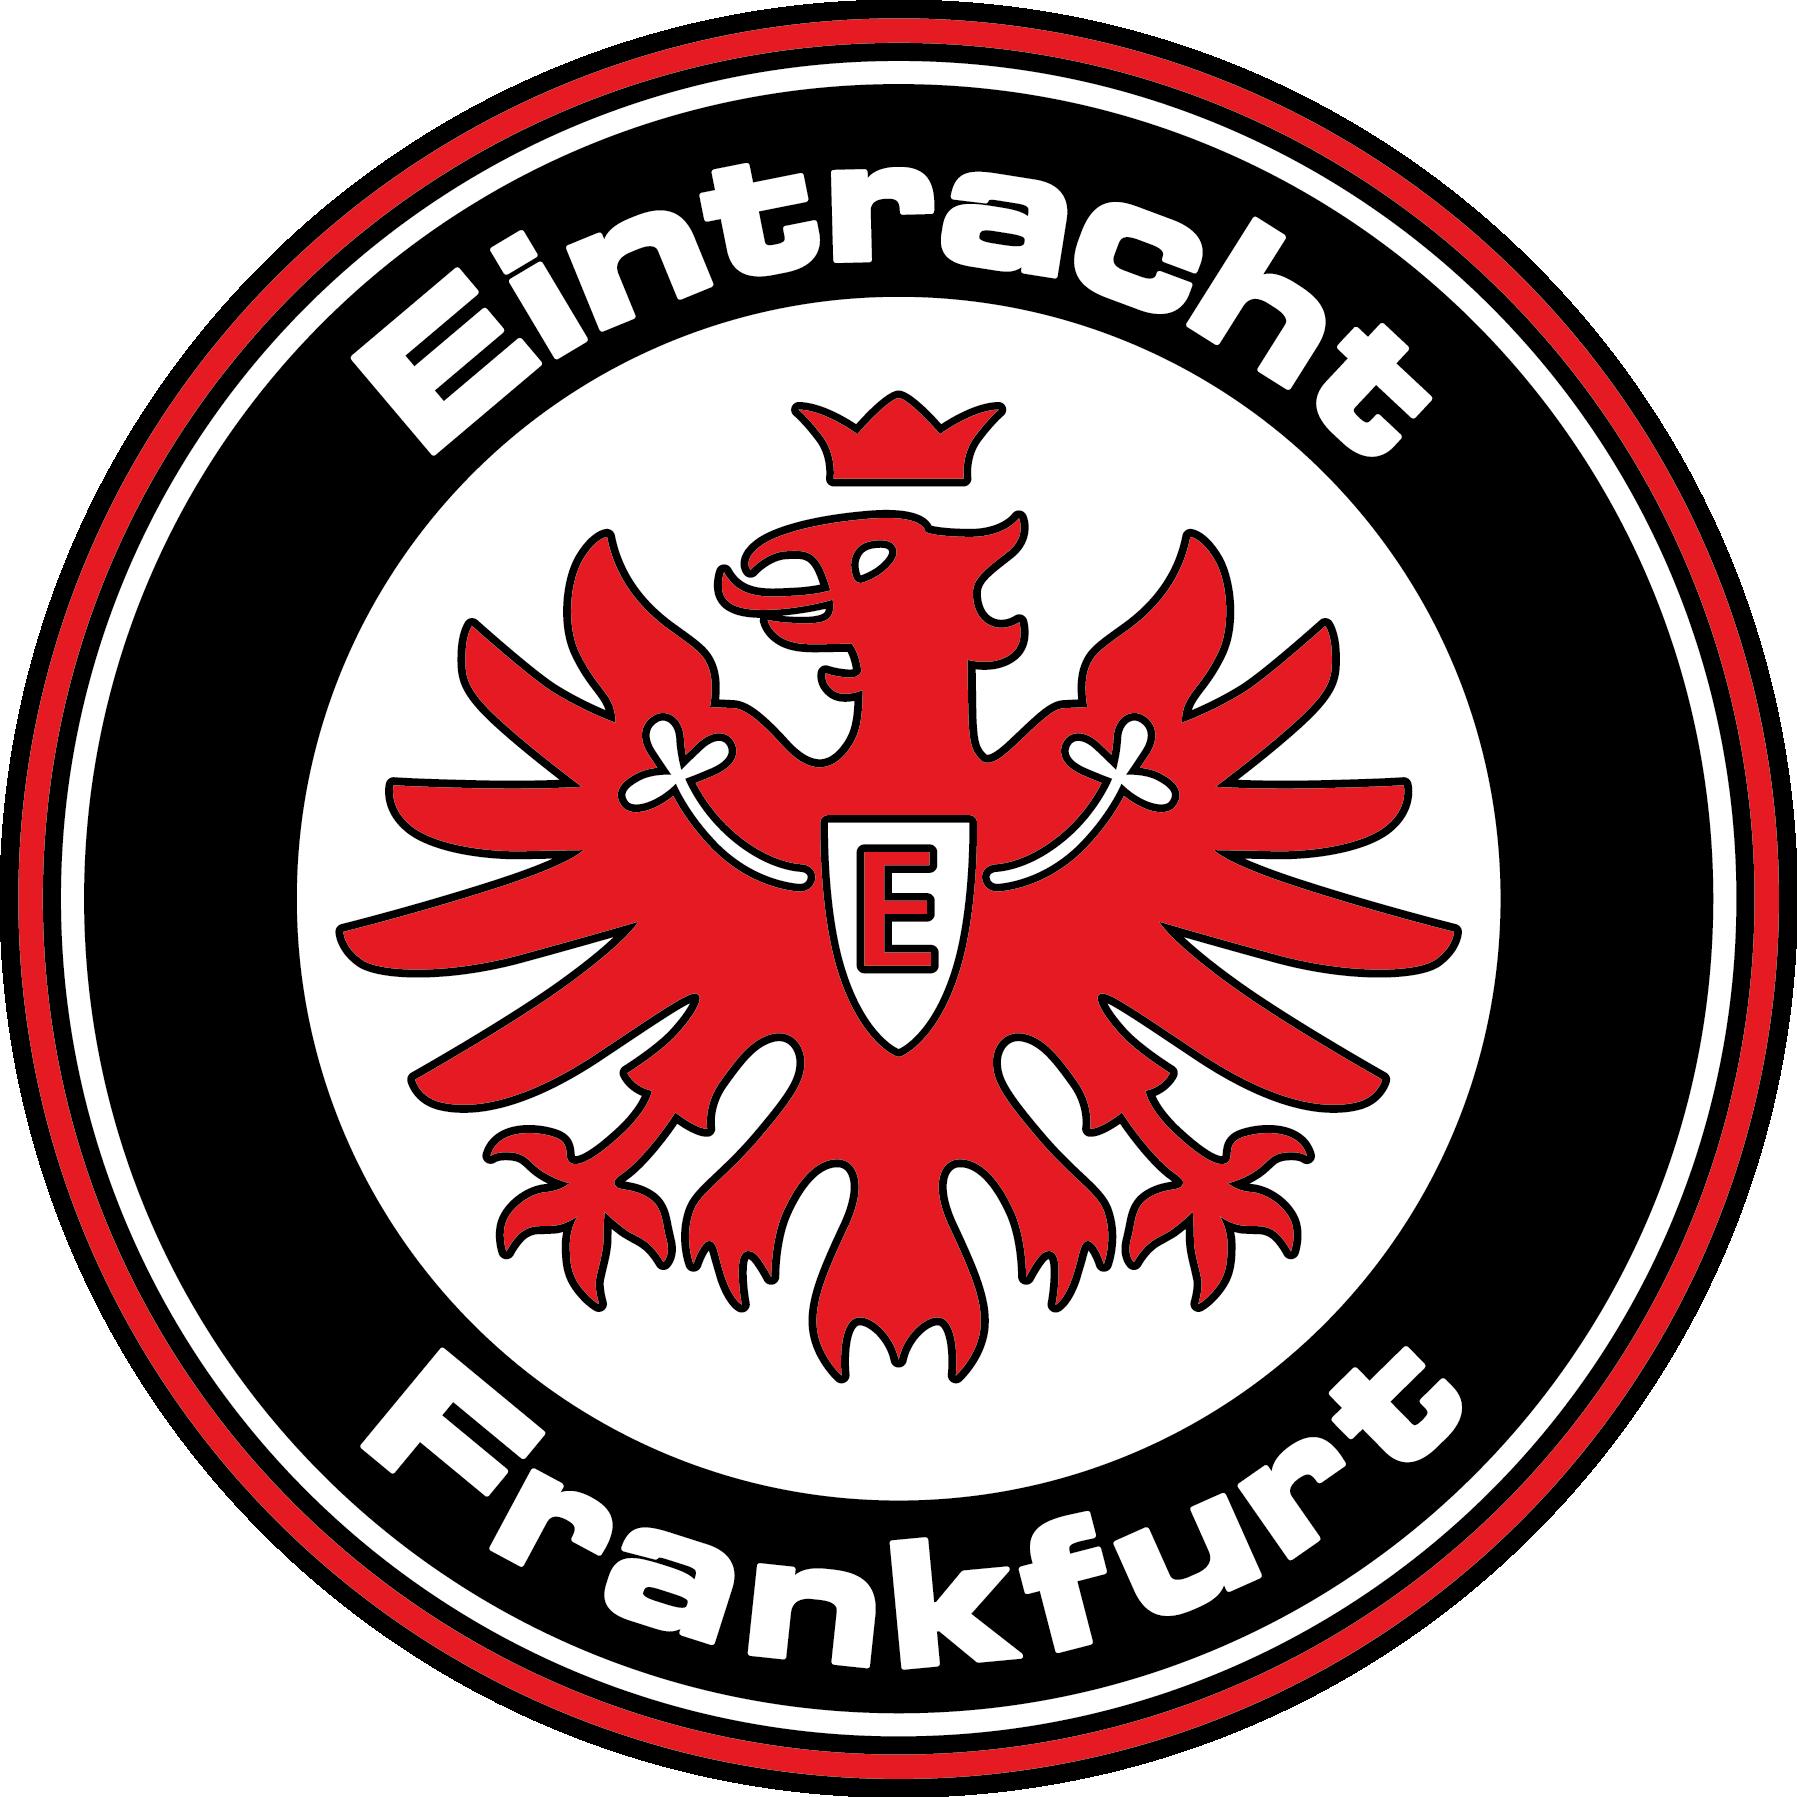 Eintracht Frankfurt Eintracht Frankfurt Logo Eintracht Frankfurt Fussball Logo Design